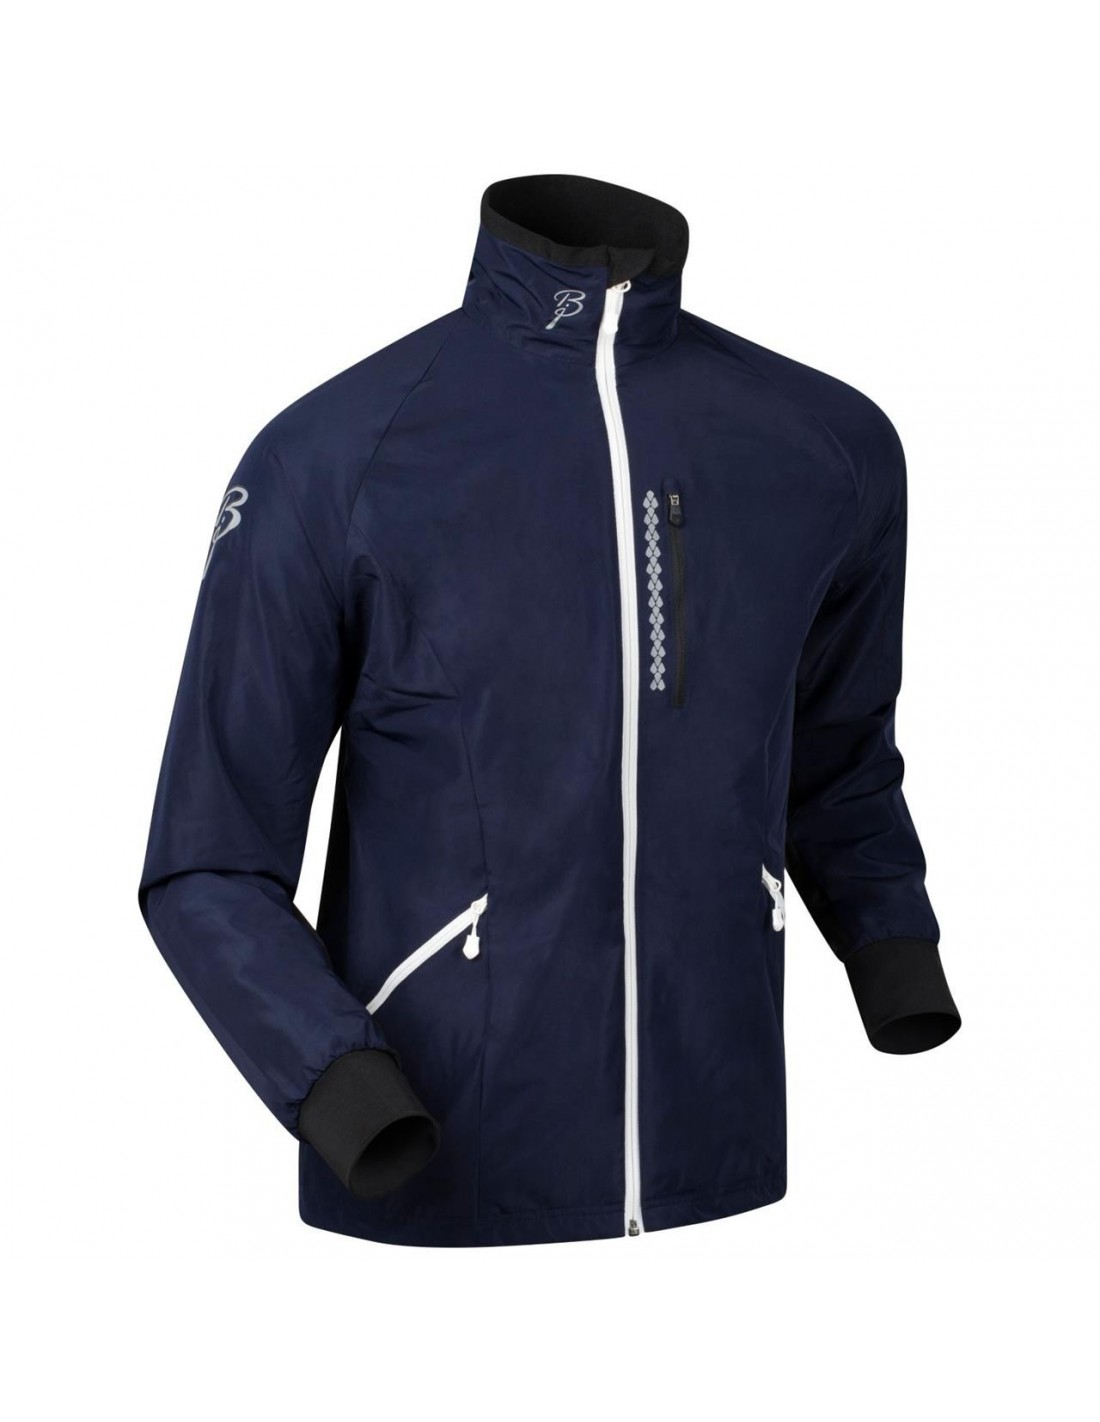 Ski og Snowboardjakker Herrer Bjørn Dæhlie Relay Jacket SportsDeal! 320334 799 kr